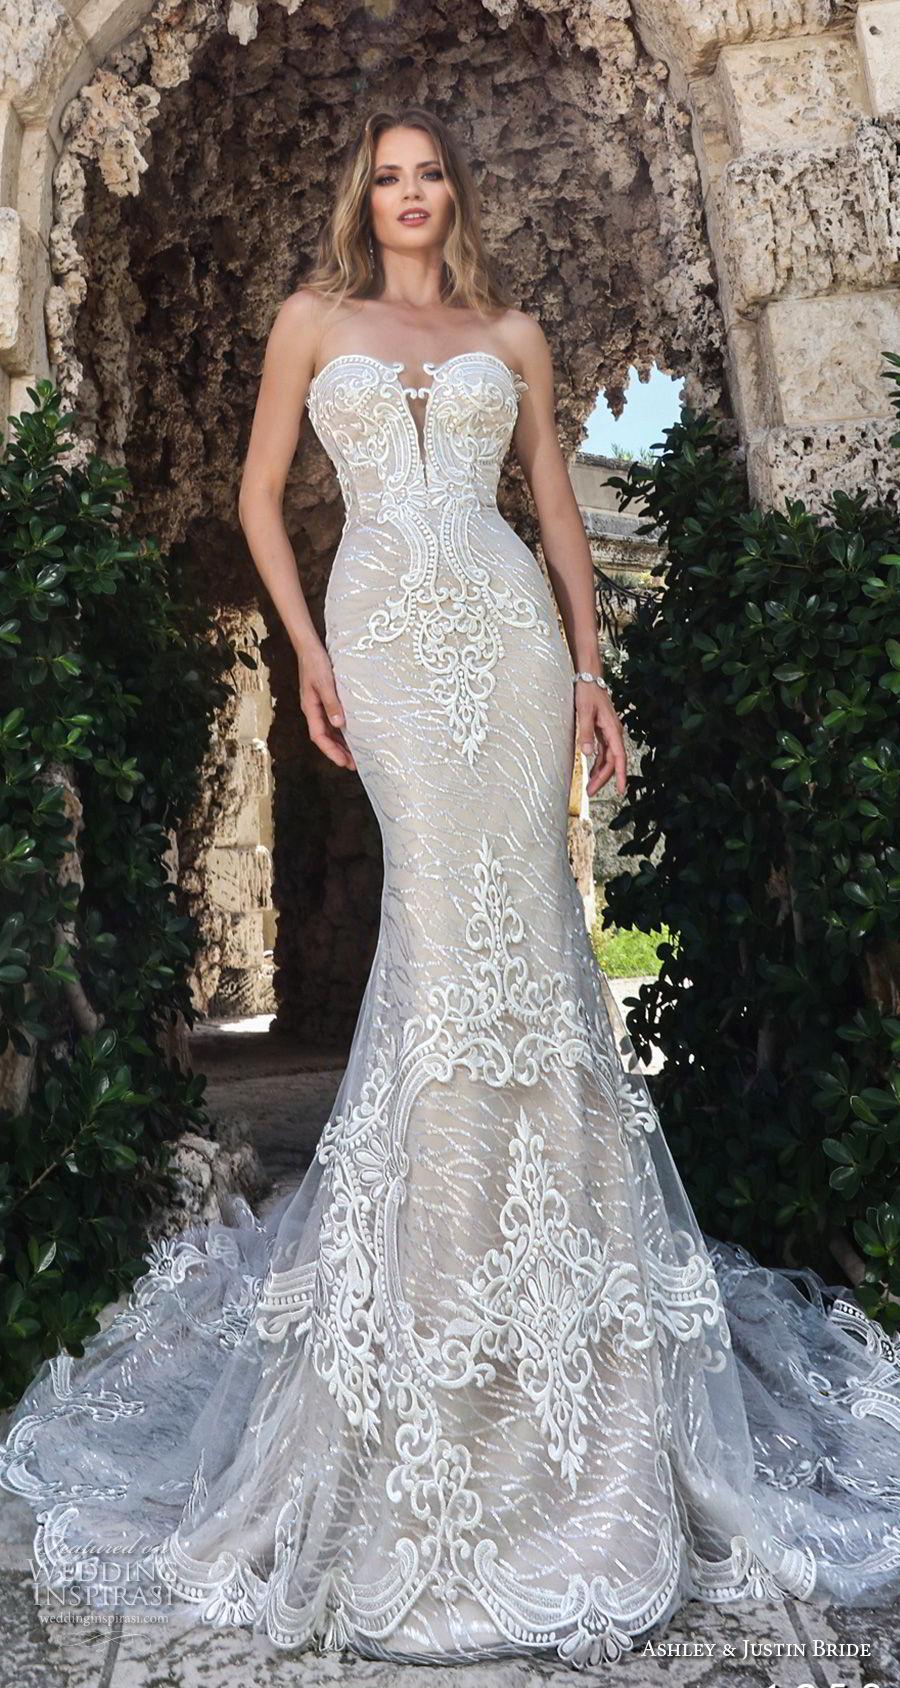 ashley justin spring 2018 bridal strapless deep plunging sweetheart neckline full embellishment elegant glamorous fit and flare wedding dress long train (8) mv